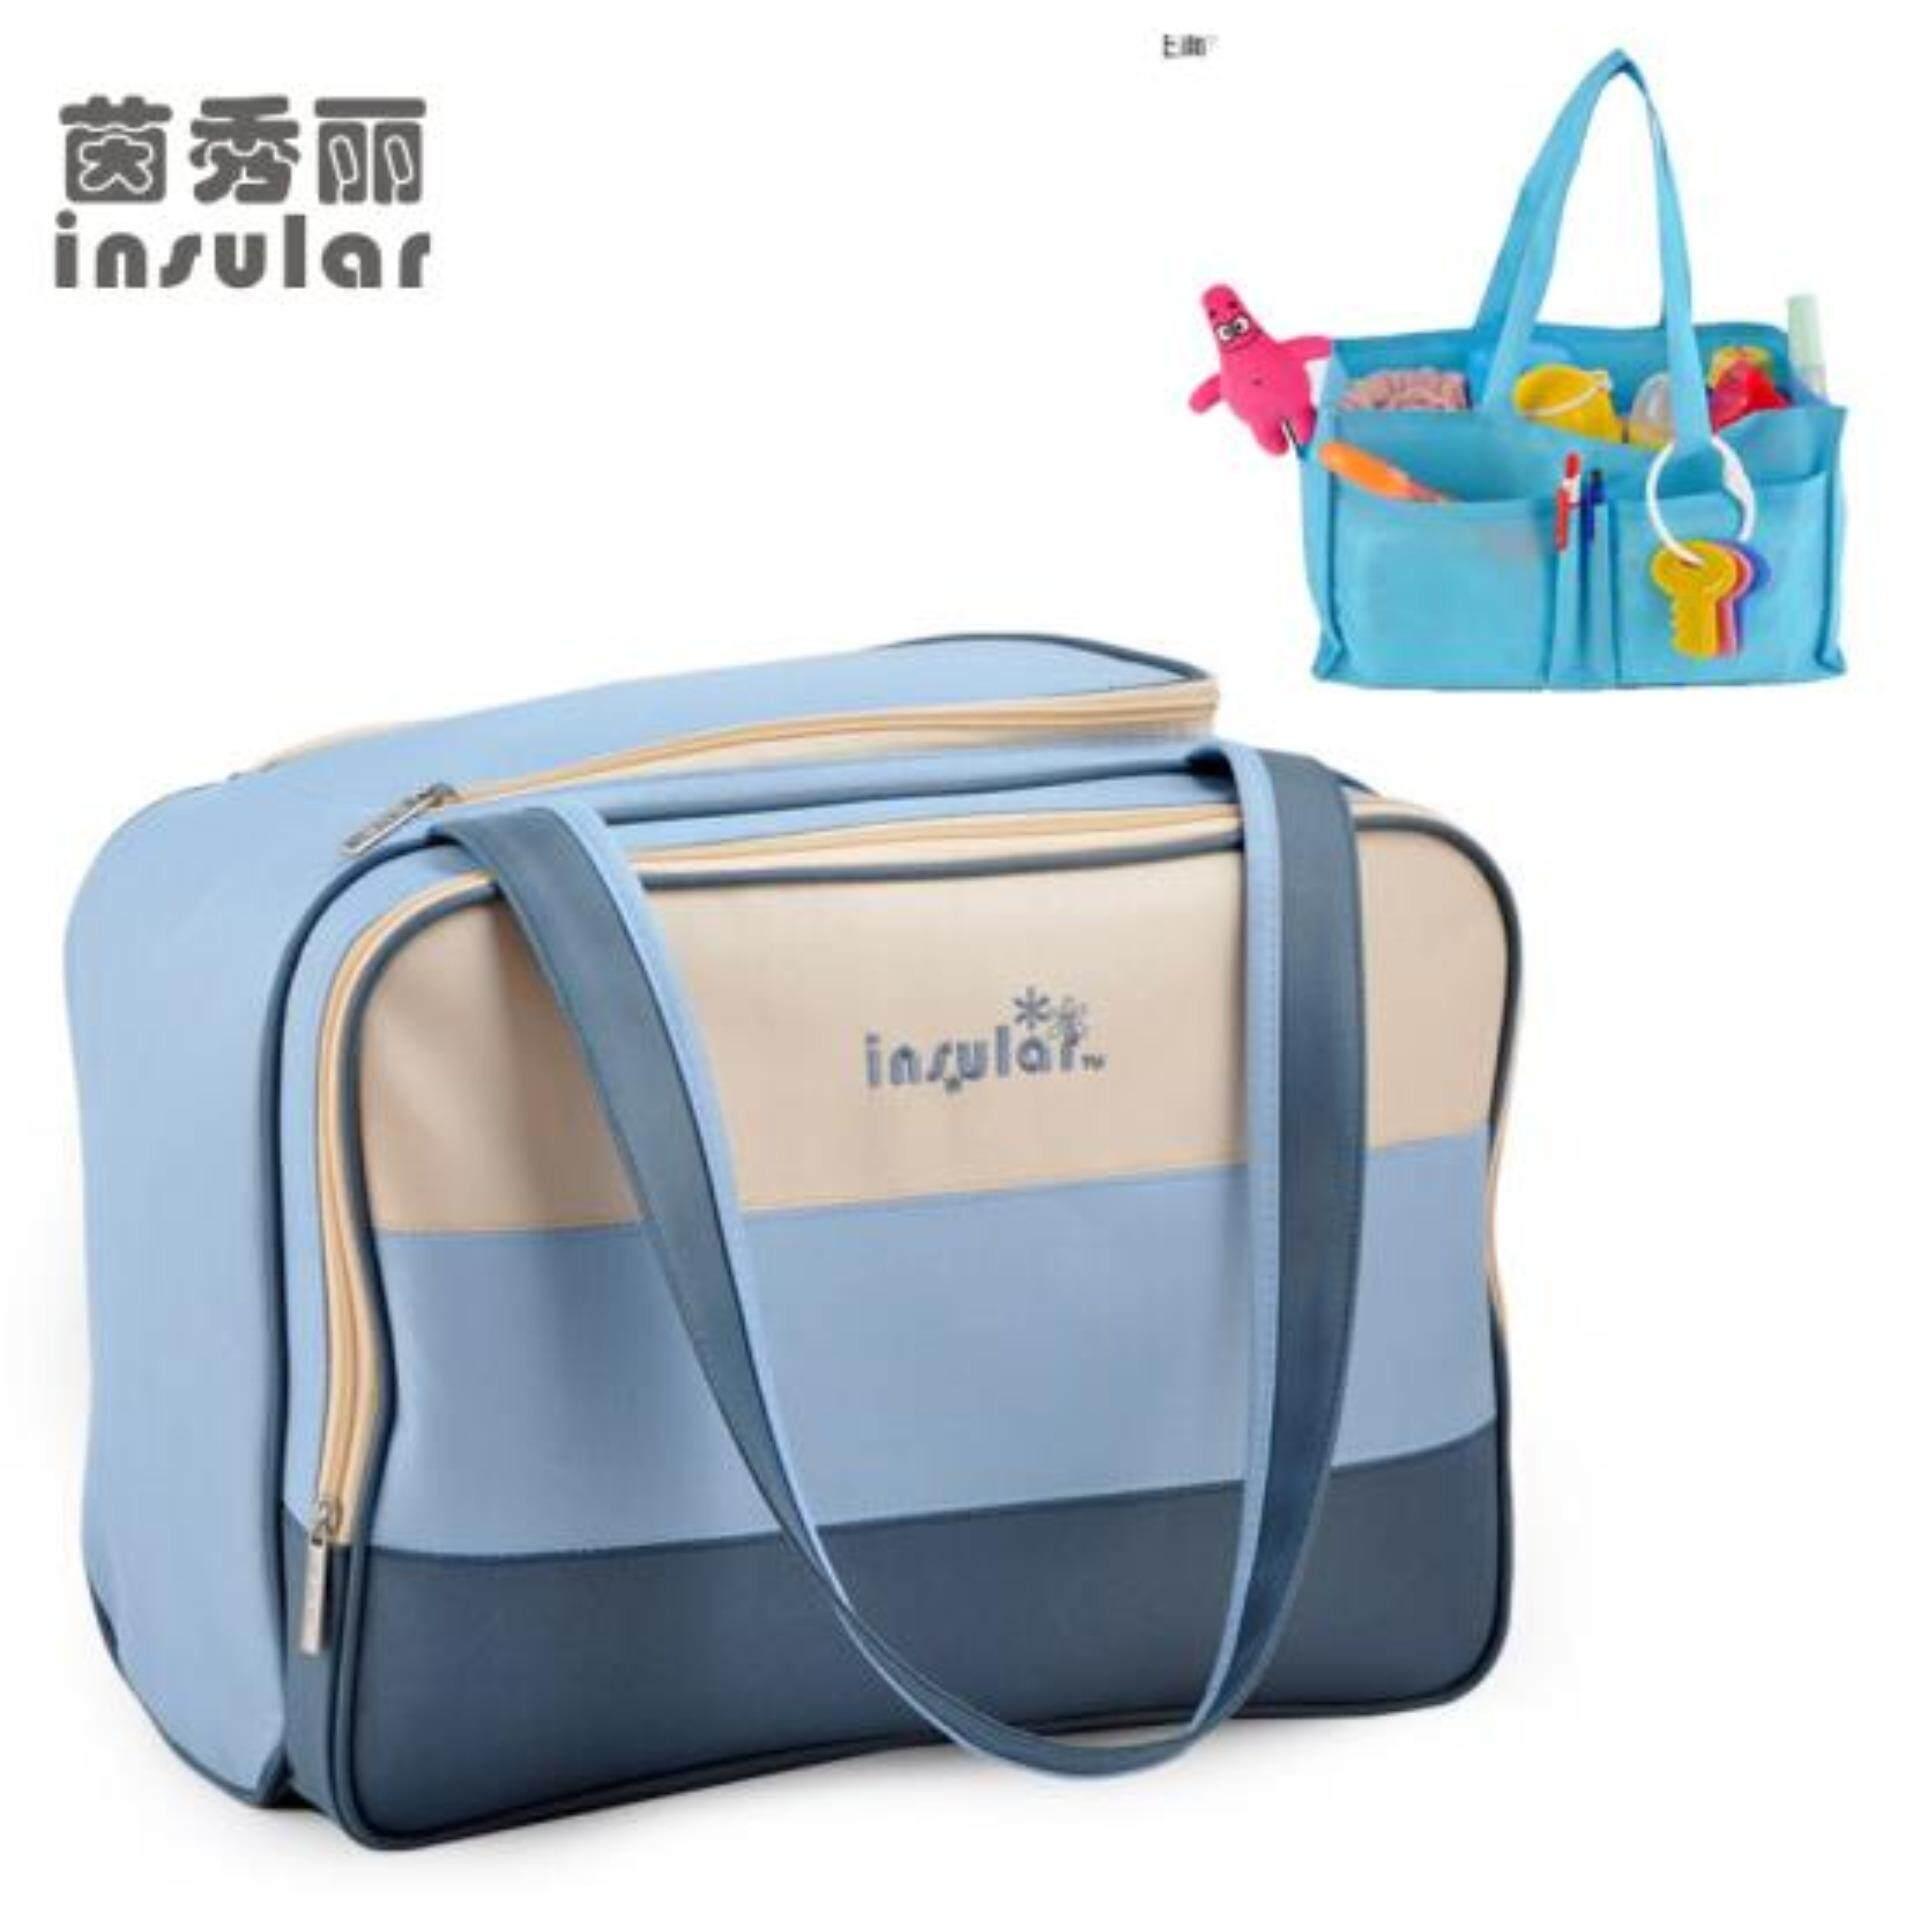 Myit New Arrival Tsumtsum Fans Minnie Sling Bag Hitam Insular Fashion Multipurpose Babymum 39cm21cm31cm 22l Blue